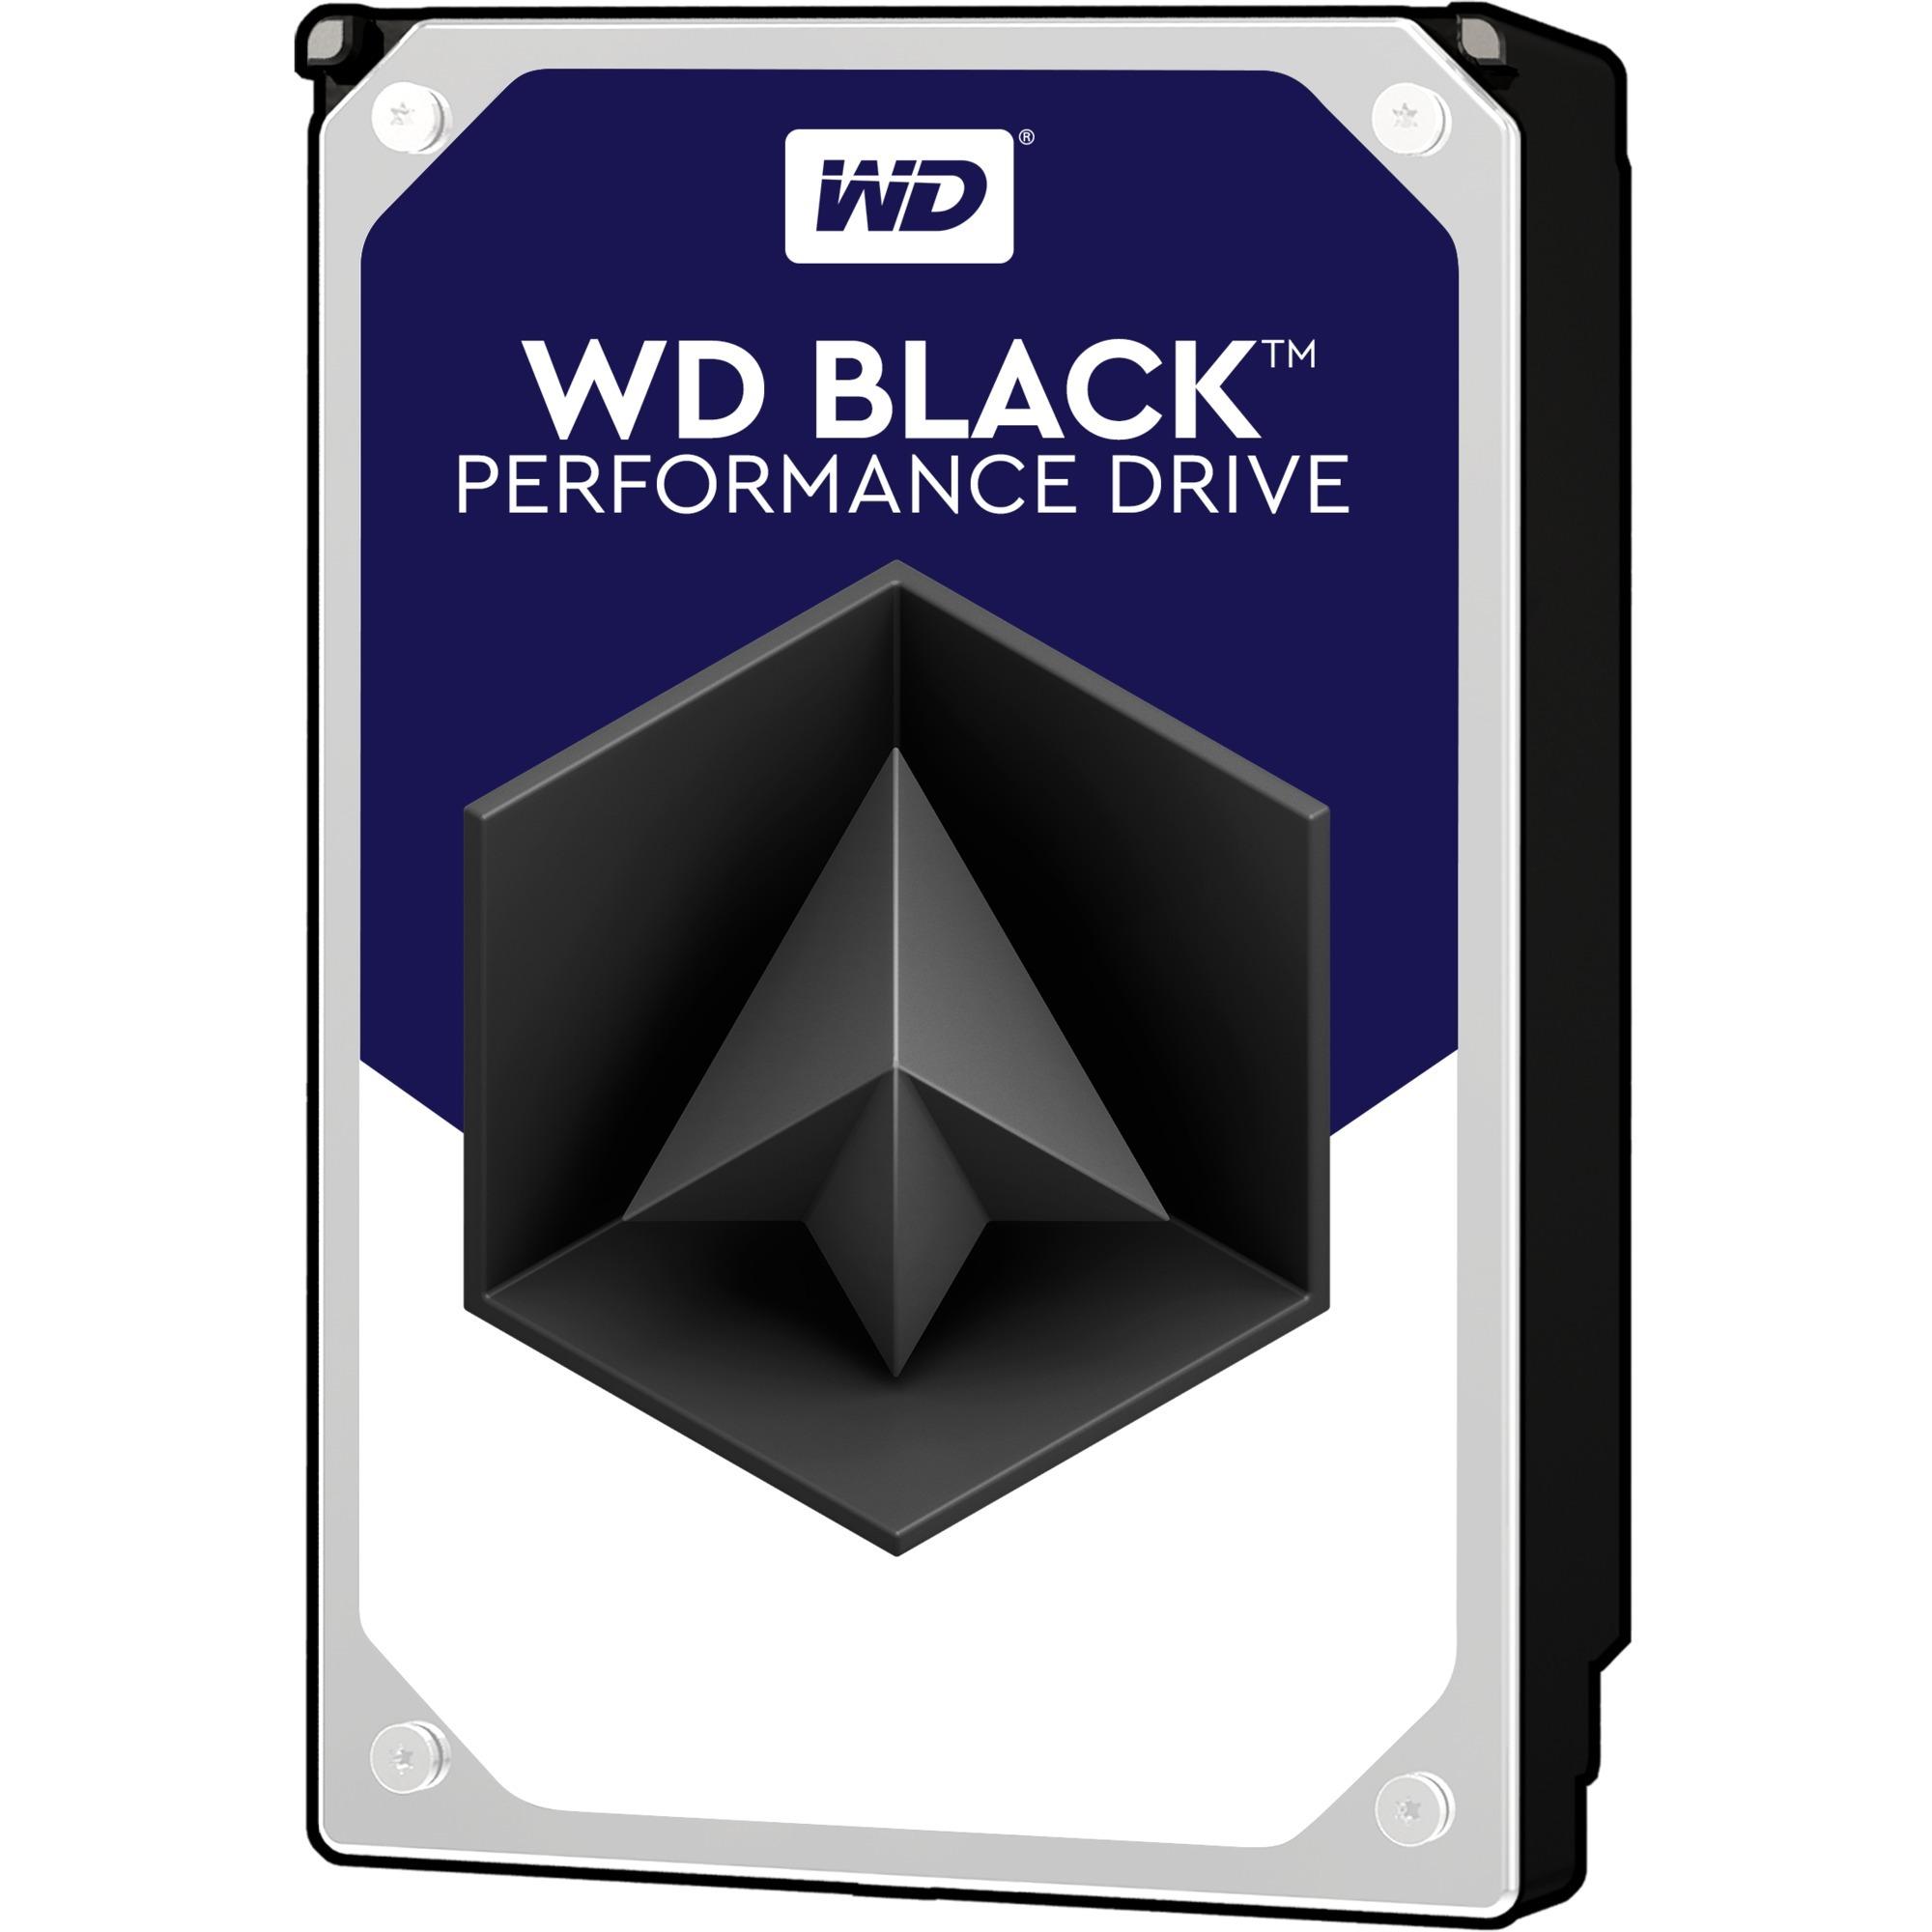 wd3200lplx-320-harddisk